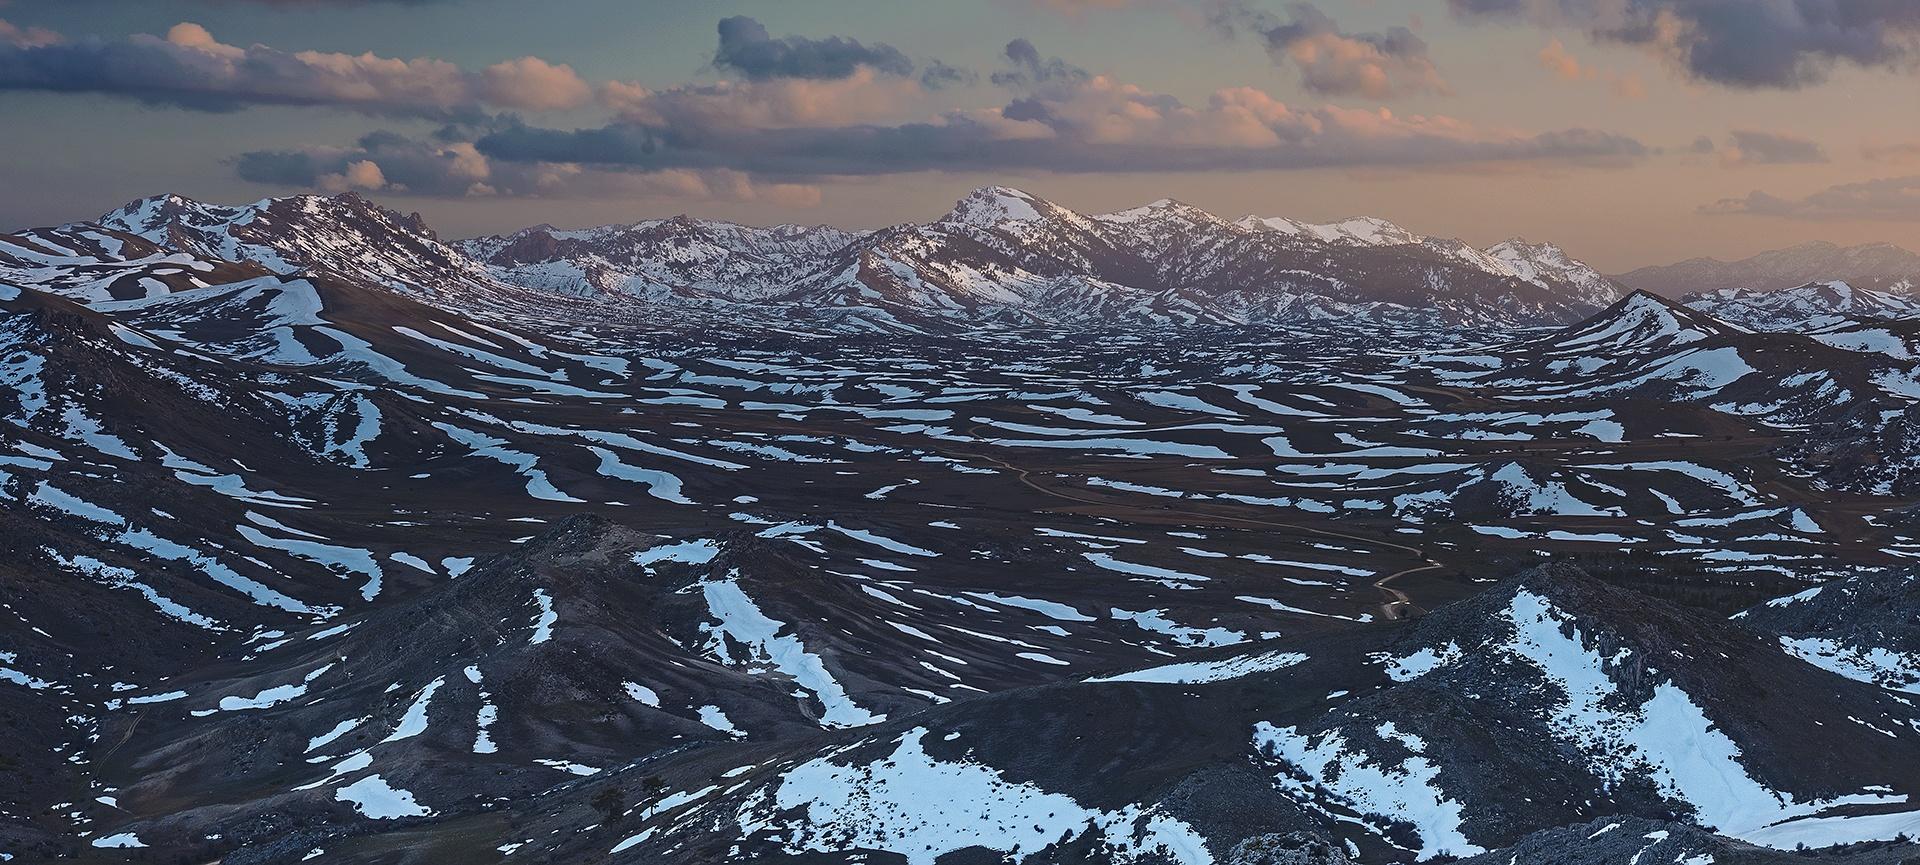 Sierra de Segura - The flow of things - Peter Manschot Al Andalus Photo Tour, Landscape photography photos prints workshops Andalusia Spain